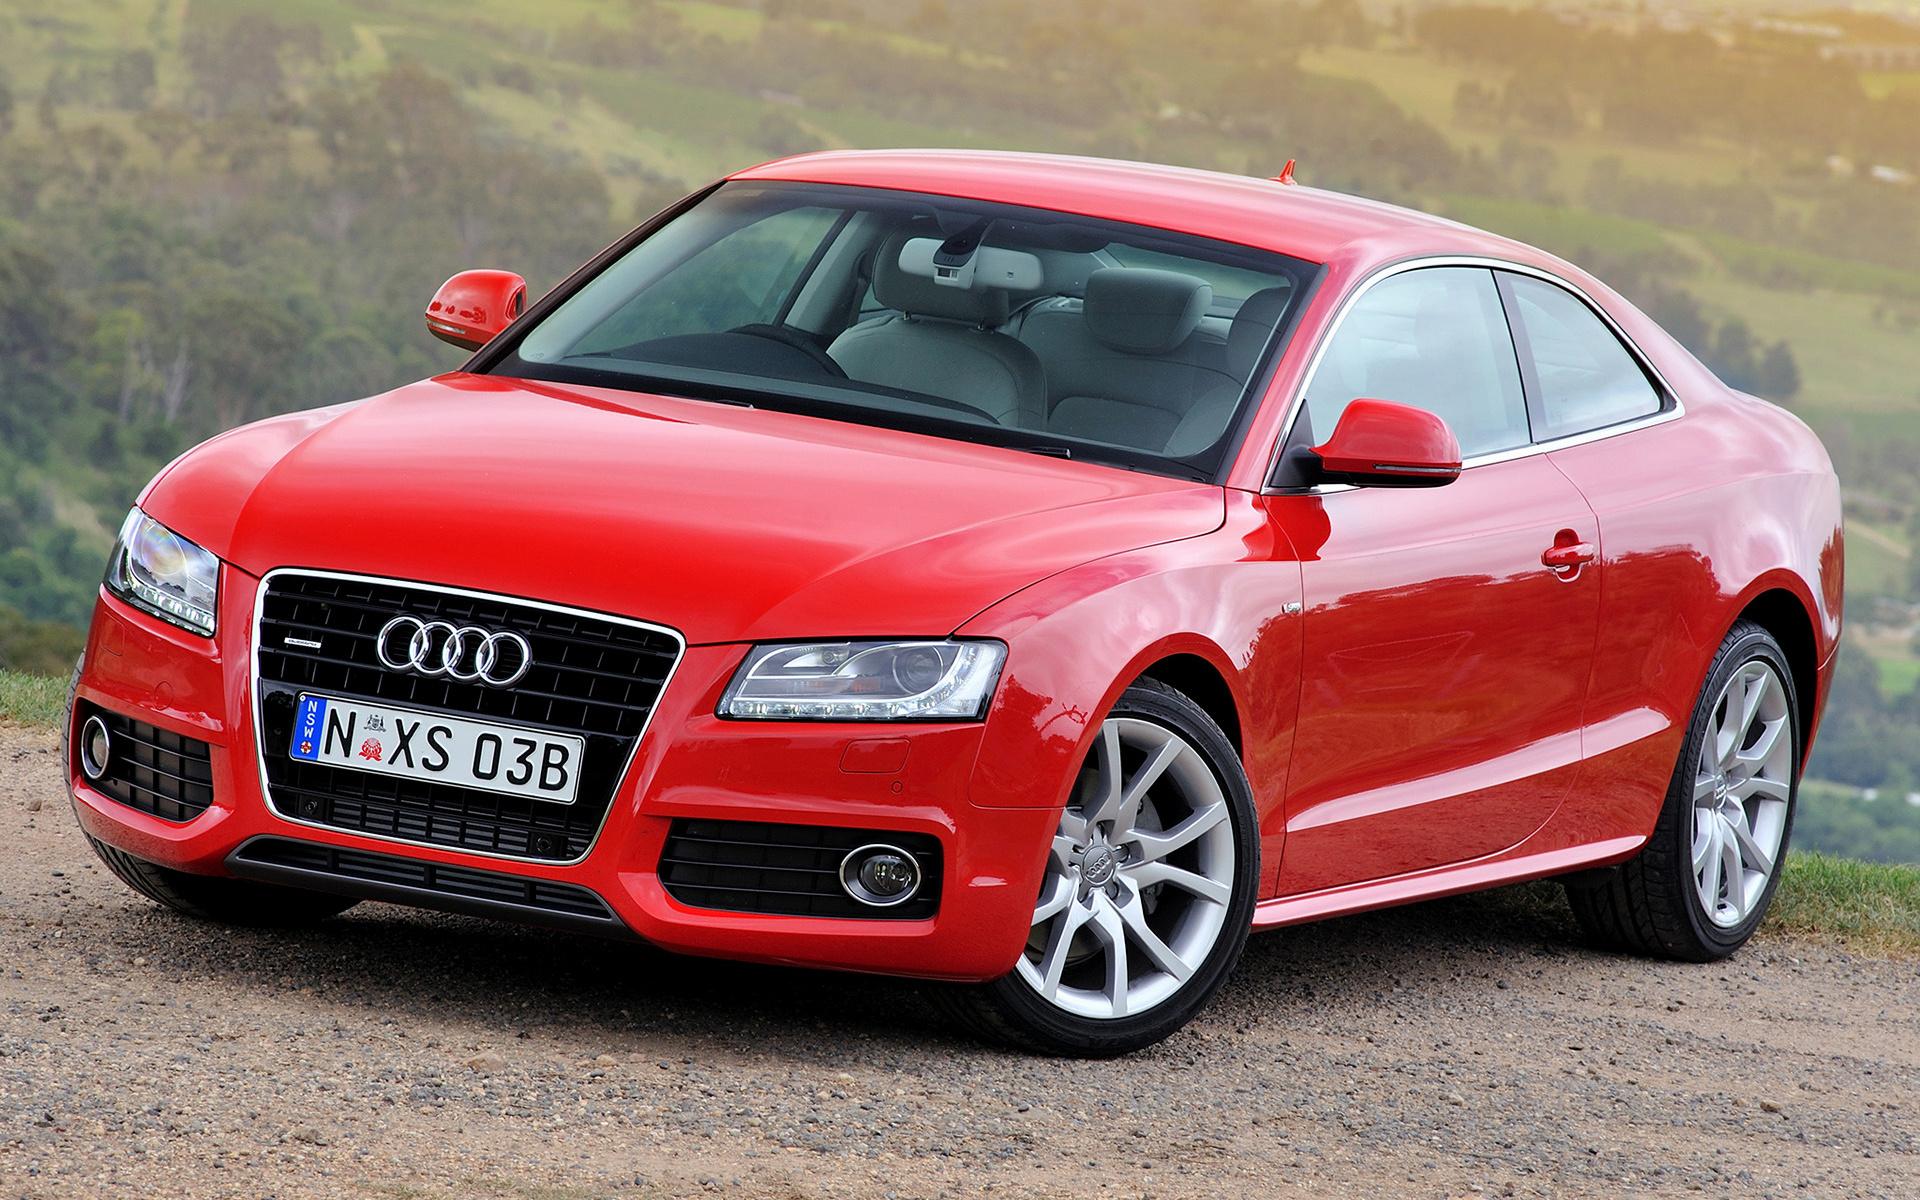 Kelebihan Audi A5 Coupe 2008 Top Model Tahun Ini